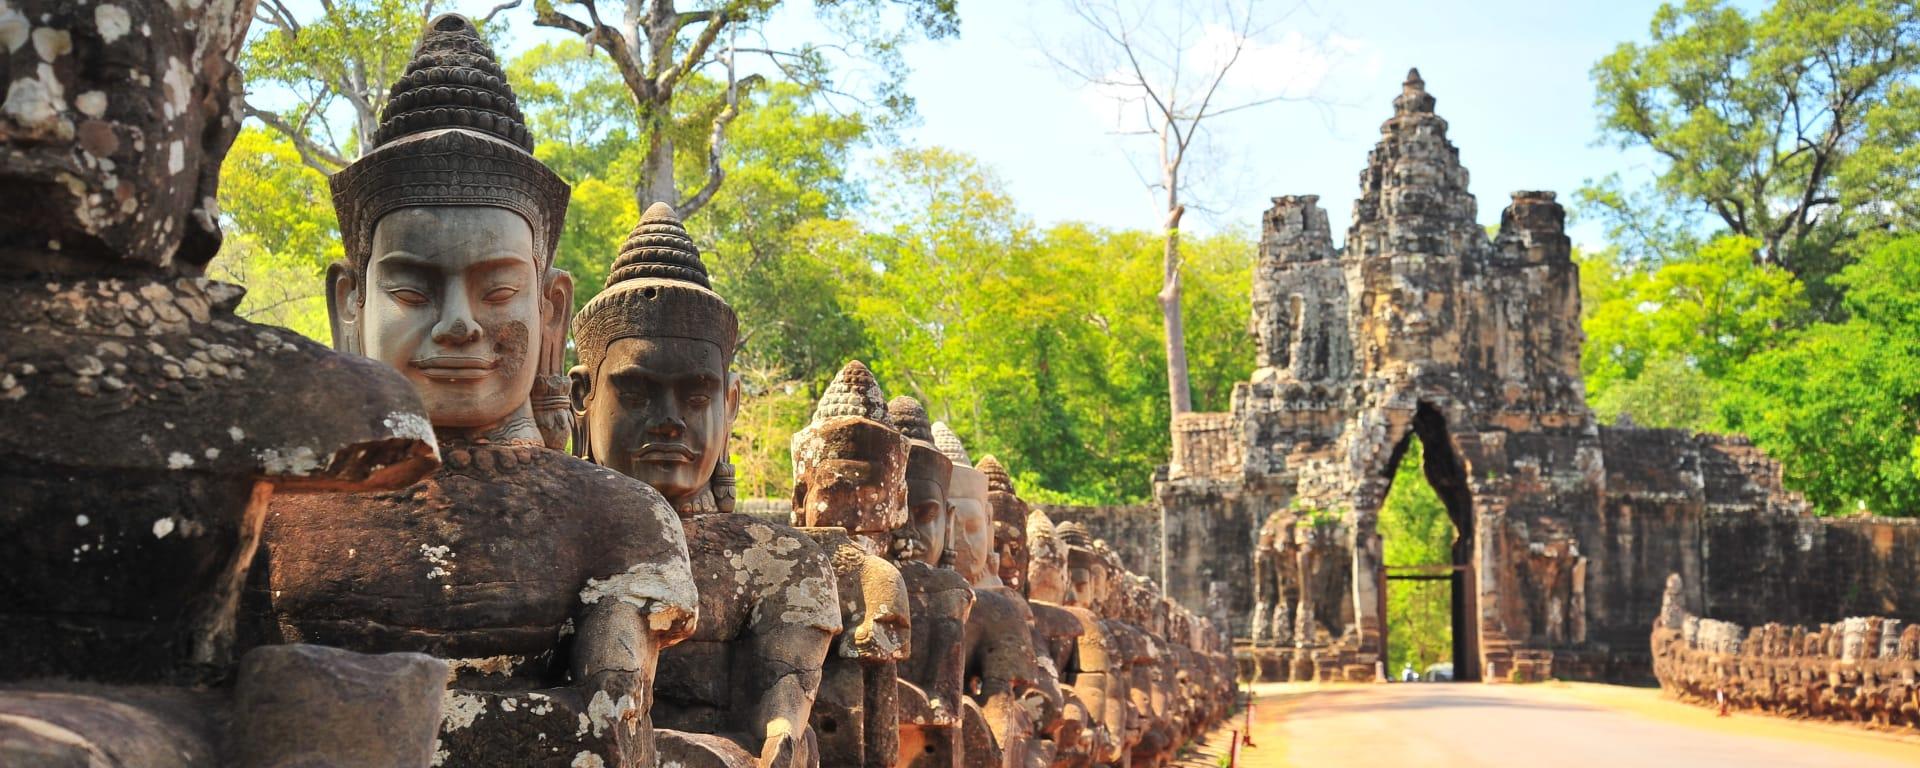 Kambodscha entdecken mit Tischler Reisen: Kambodscha Angkor Thom Steintor